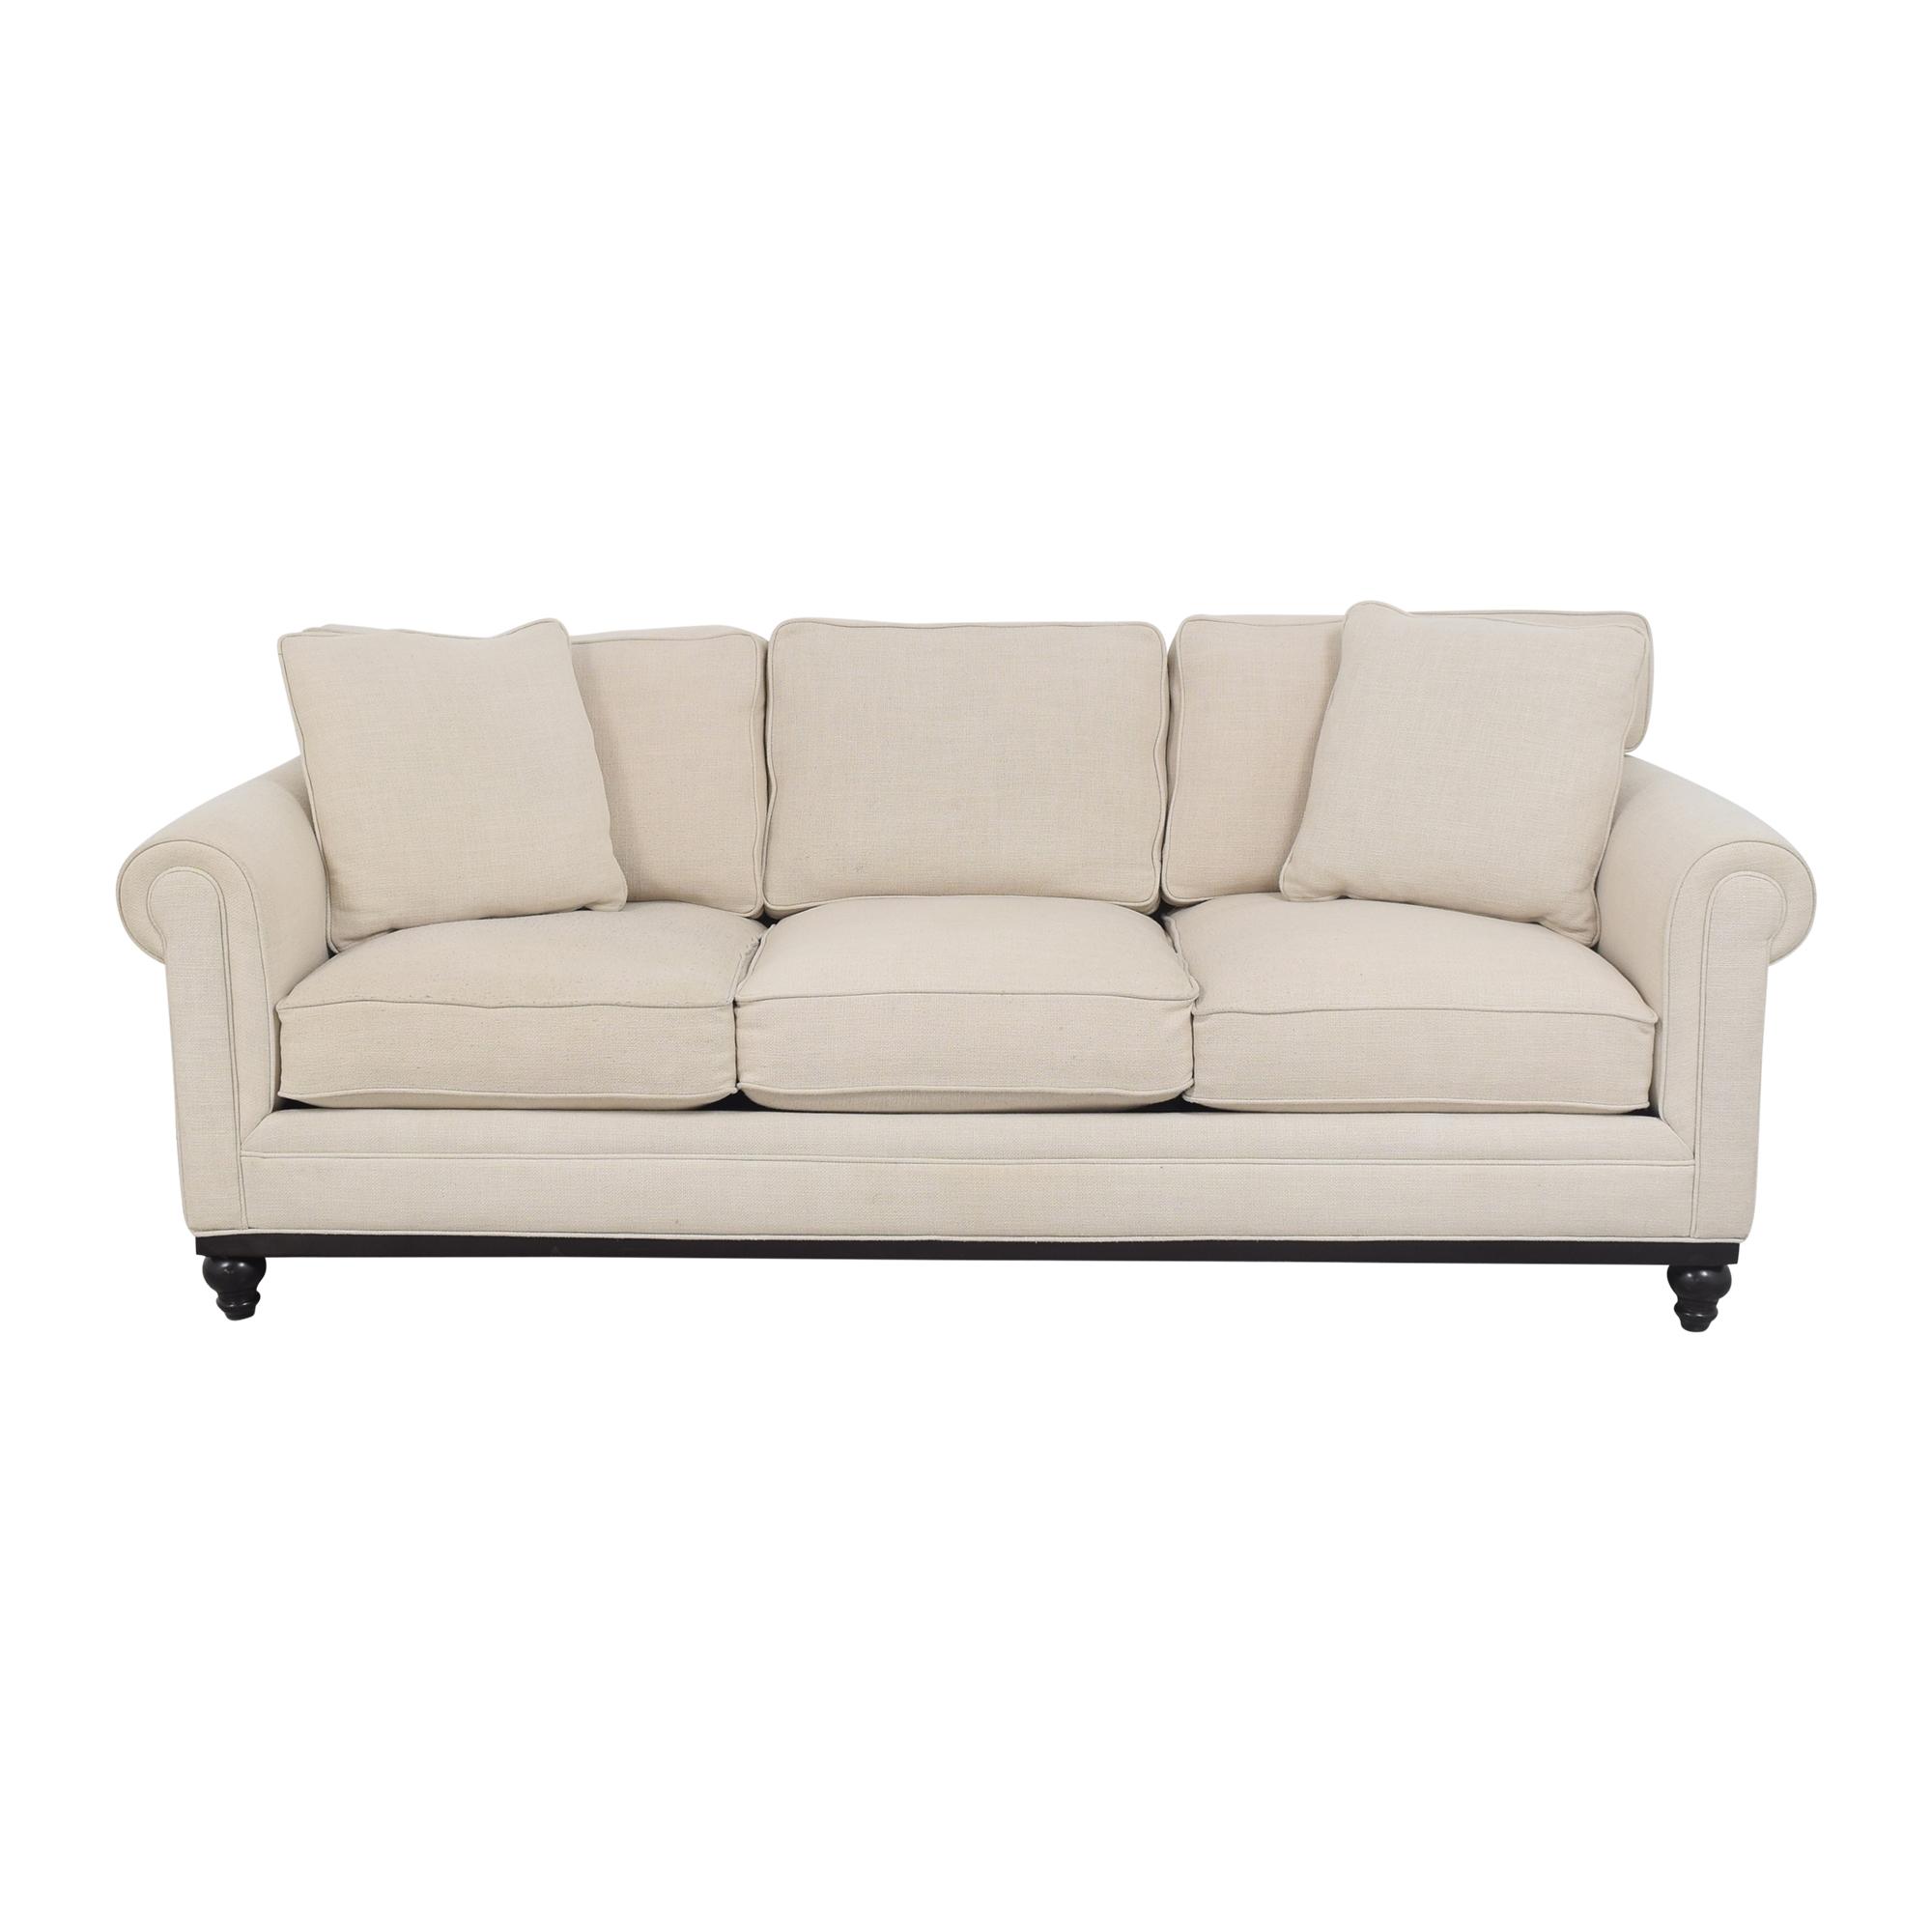 Macy's Martha Stewart Collection Club Sofa / Classic Sofas